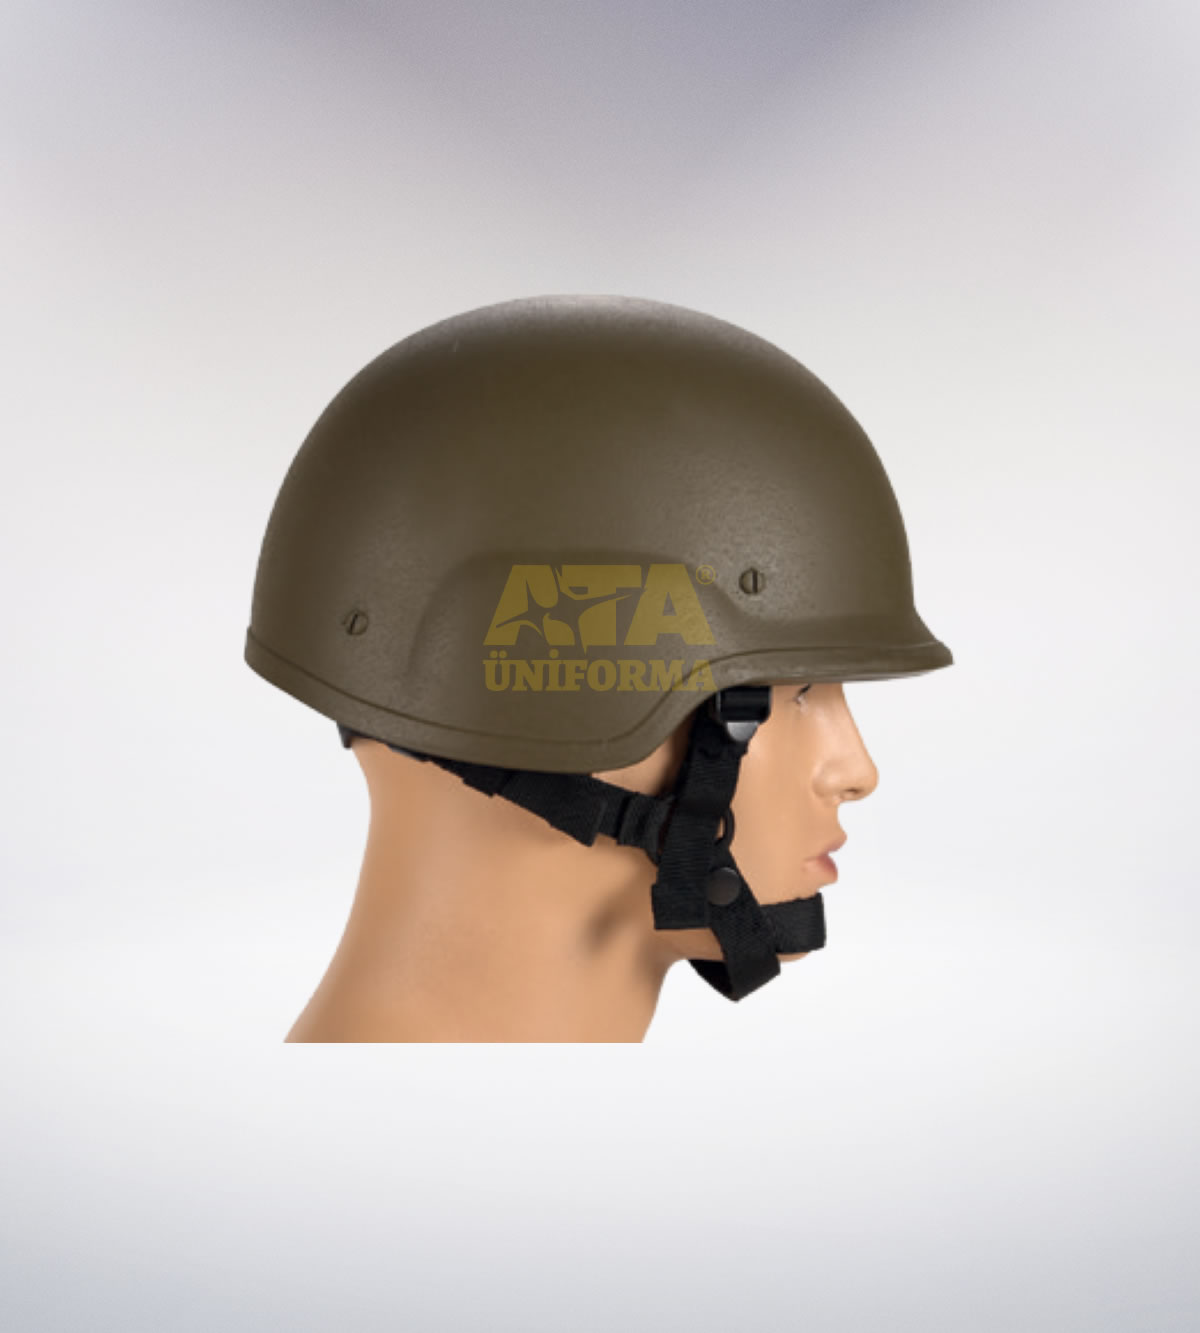 ATA-1121 Asker ve polis kask  - asker ve polis elbiseleri | asker ve polis üniformaları | asker ve polis kıyafetleri